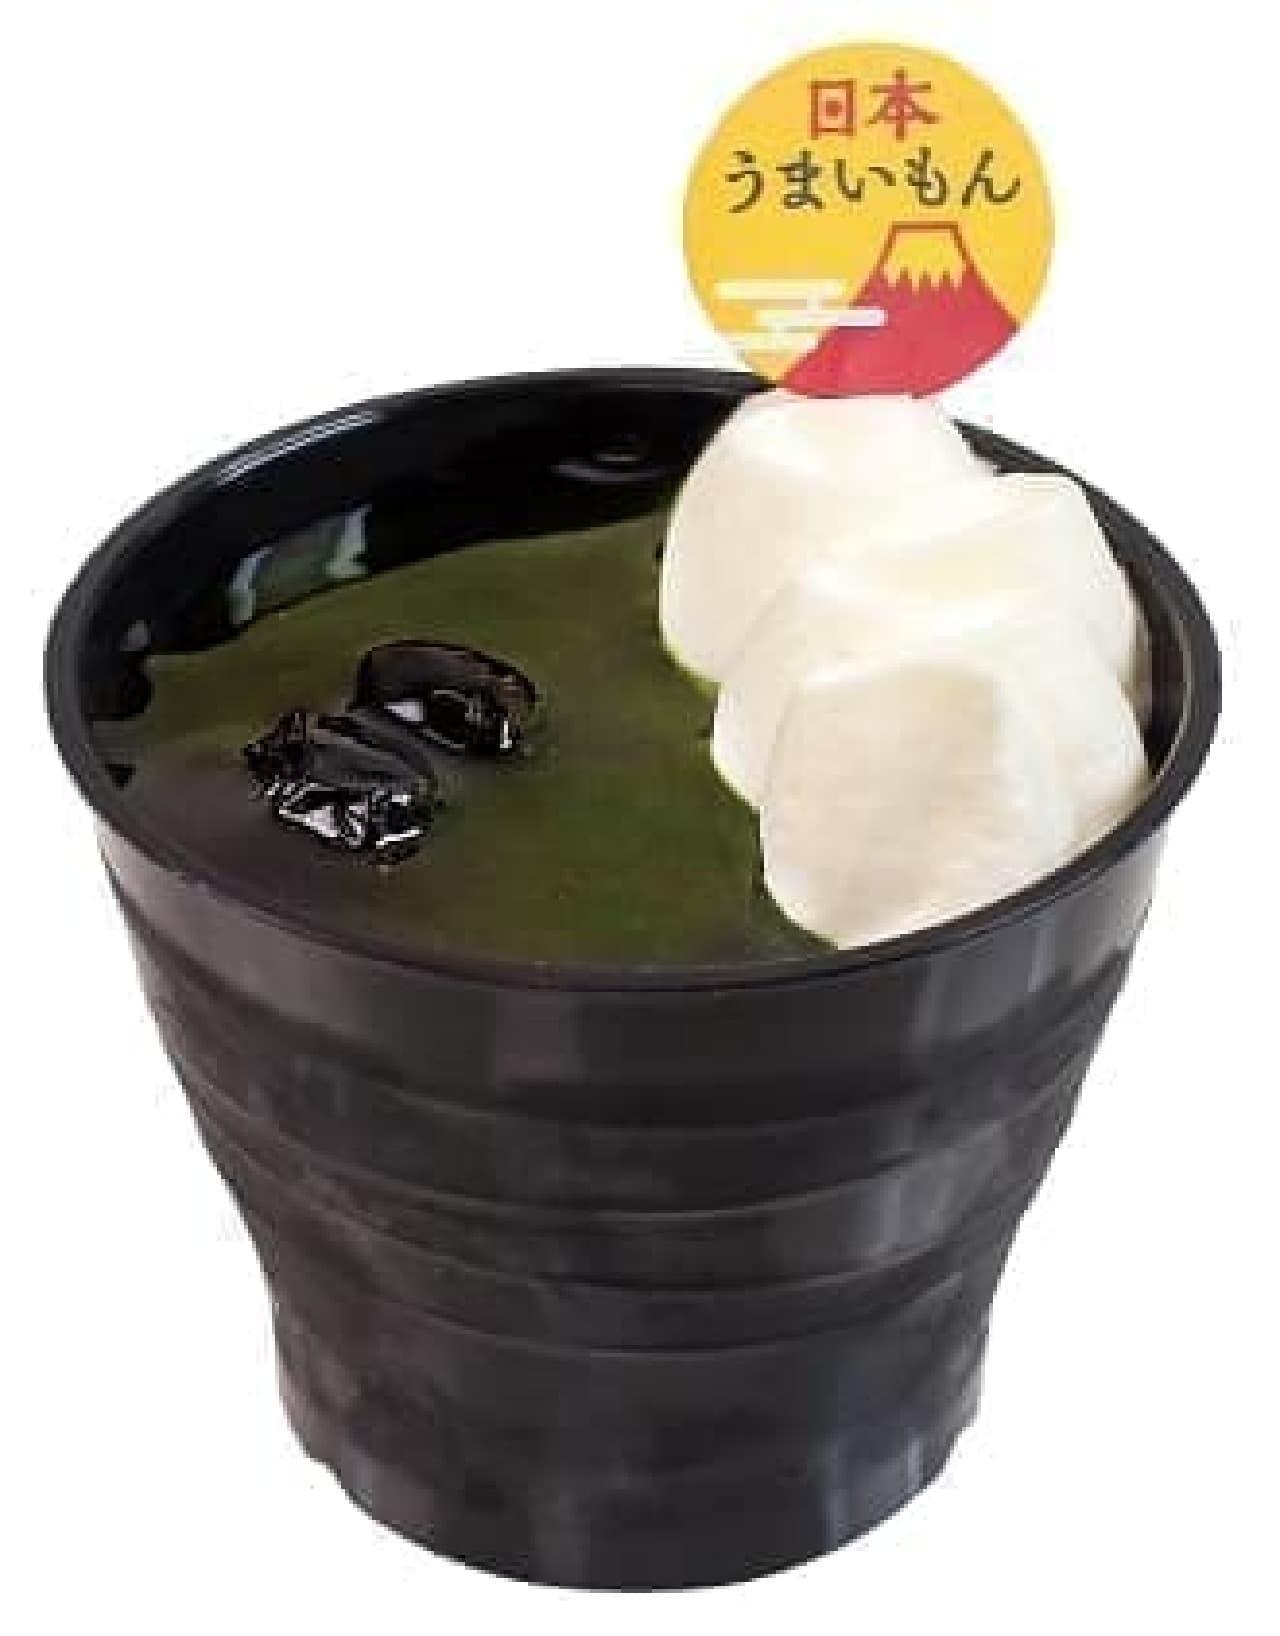 不二家洋菓子店「京都府産宇治抹茶のプリン」